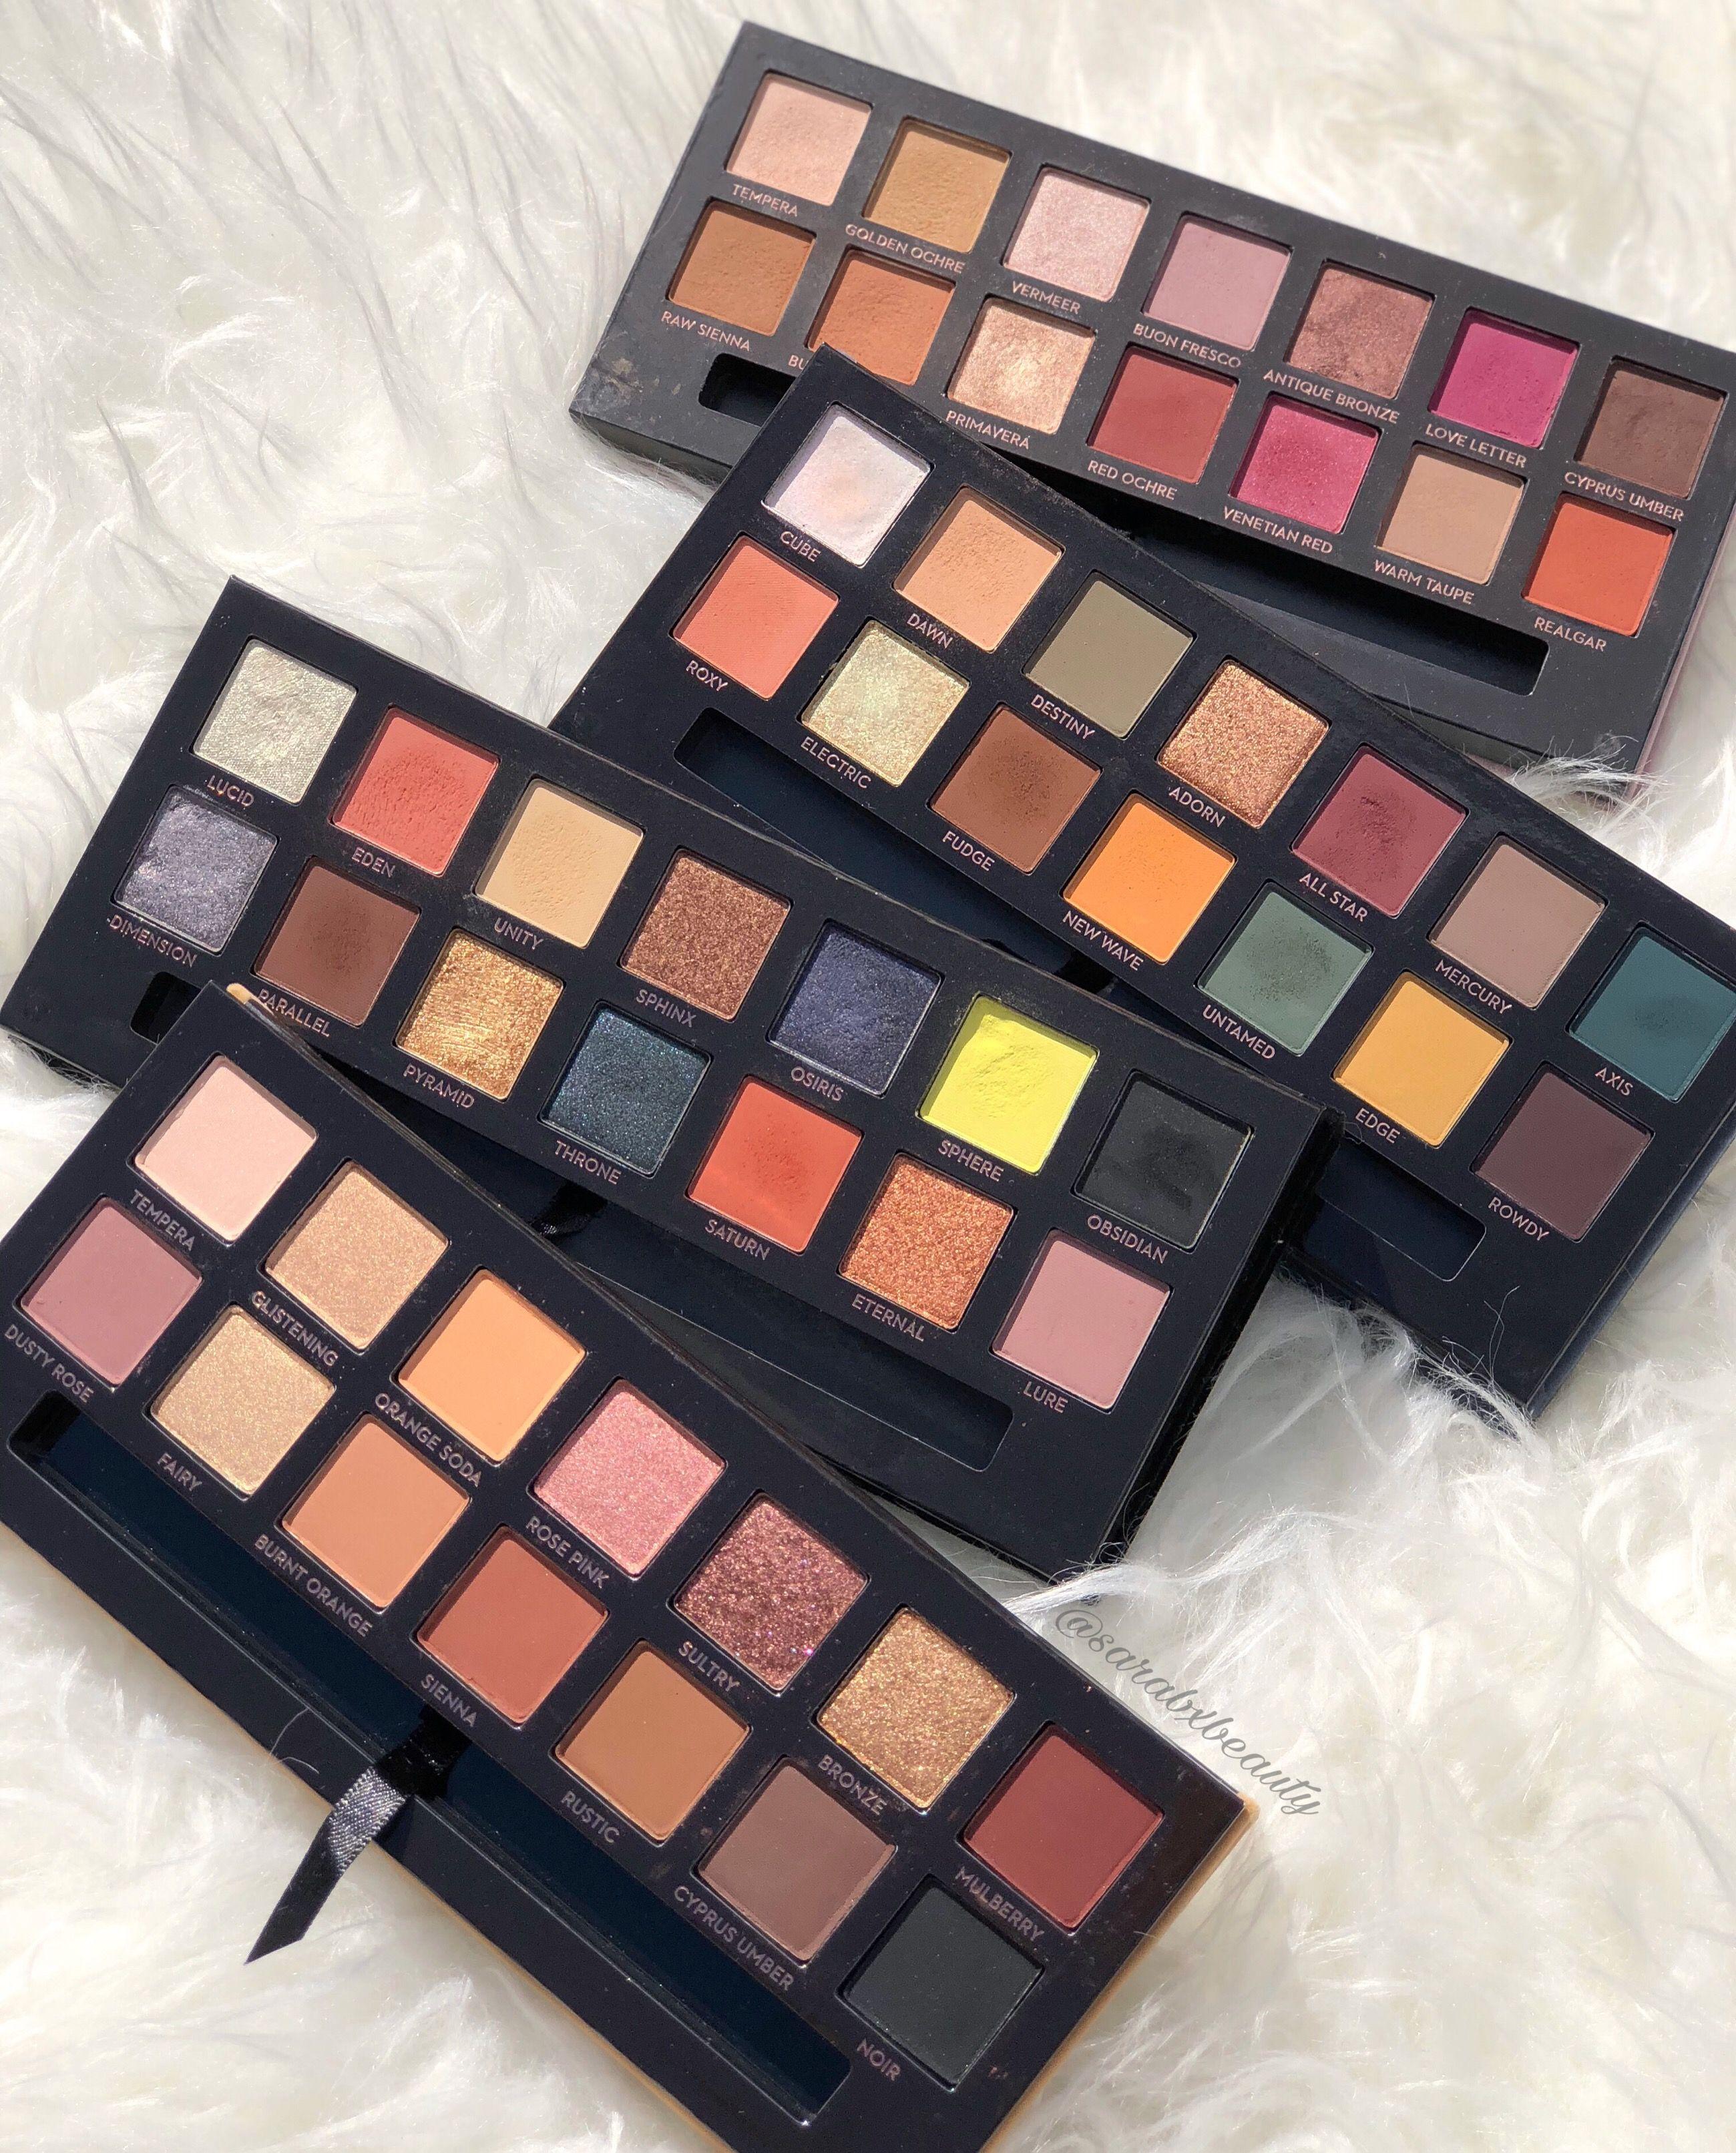 Anastasia Beverly Hills Palettes Insta Sarabxbeauty Makeup Lover Eye Makeup Sephora Makeup